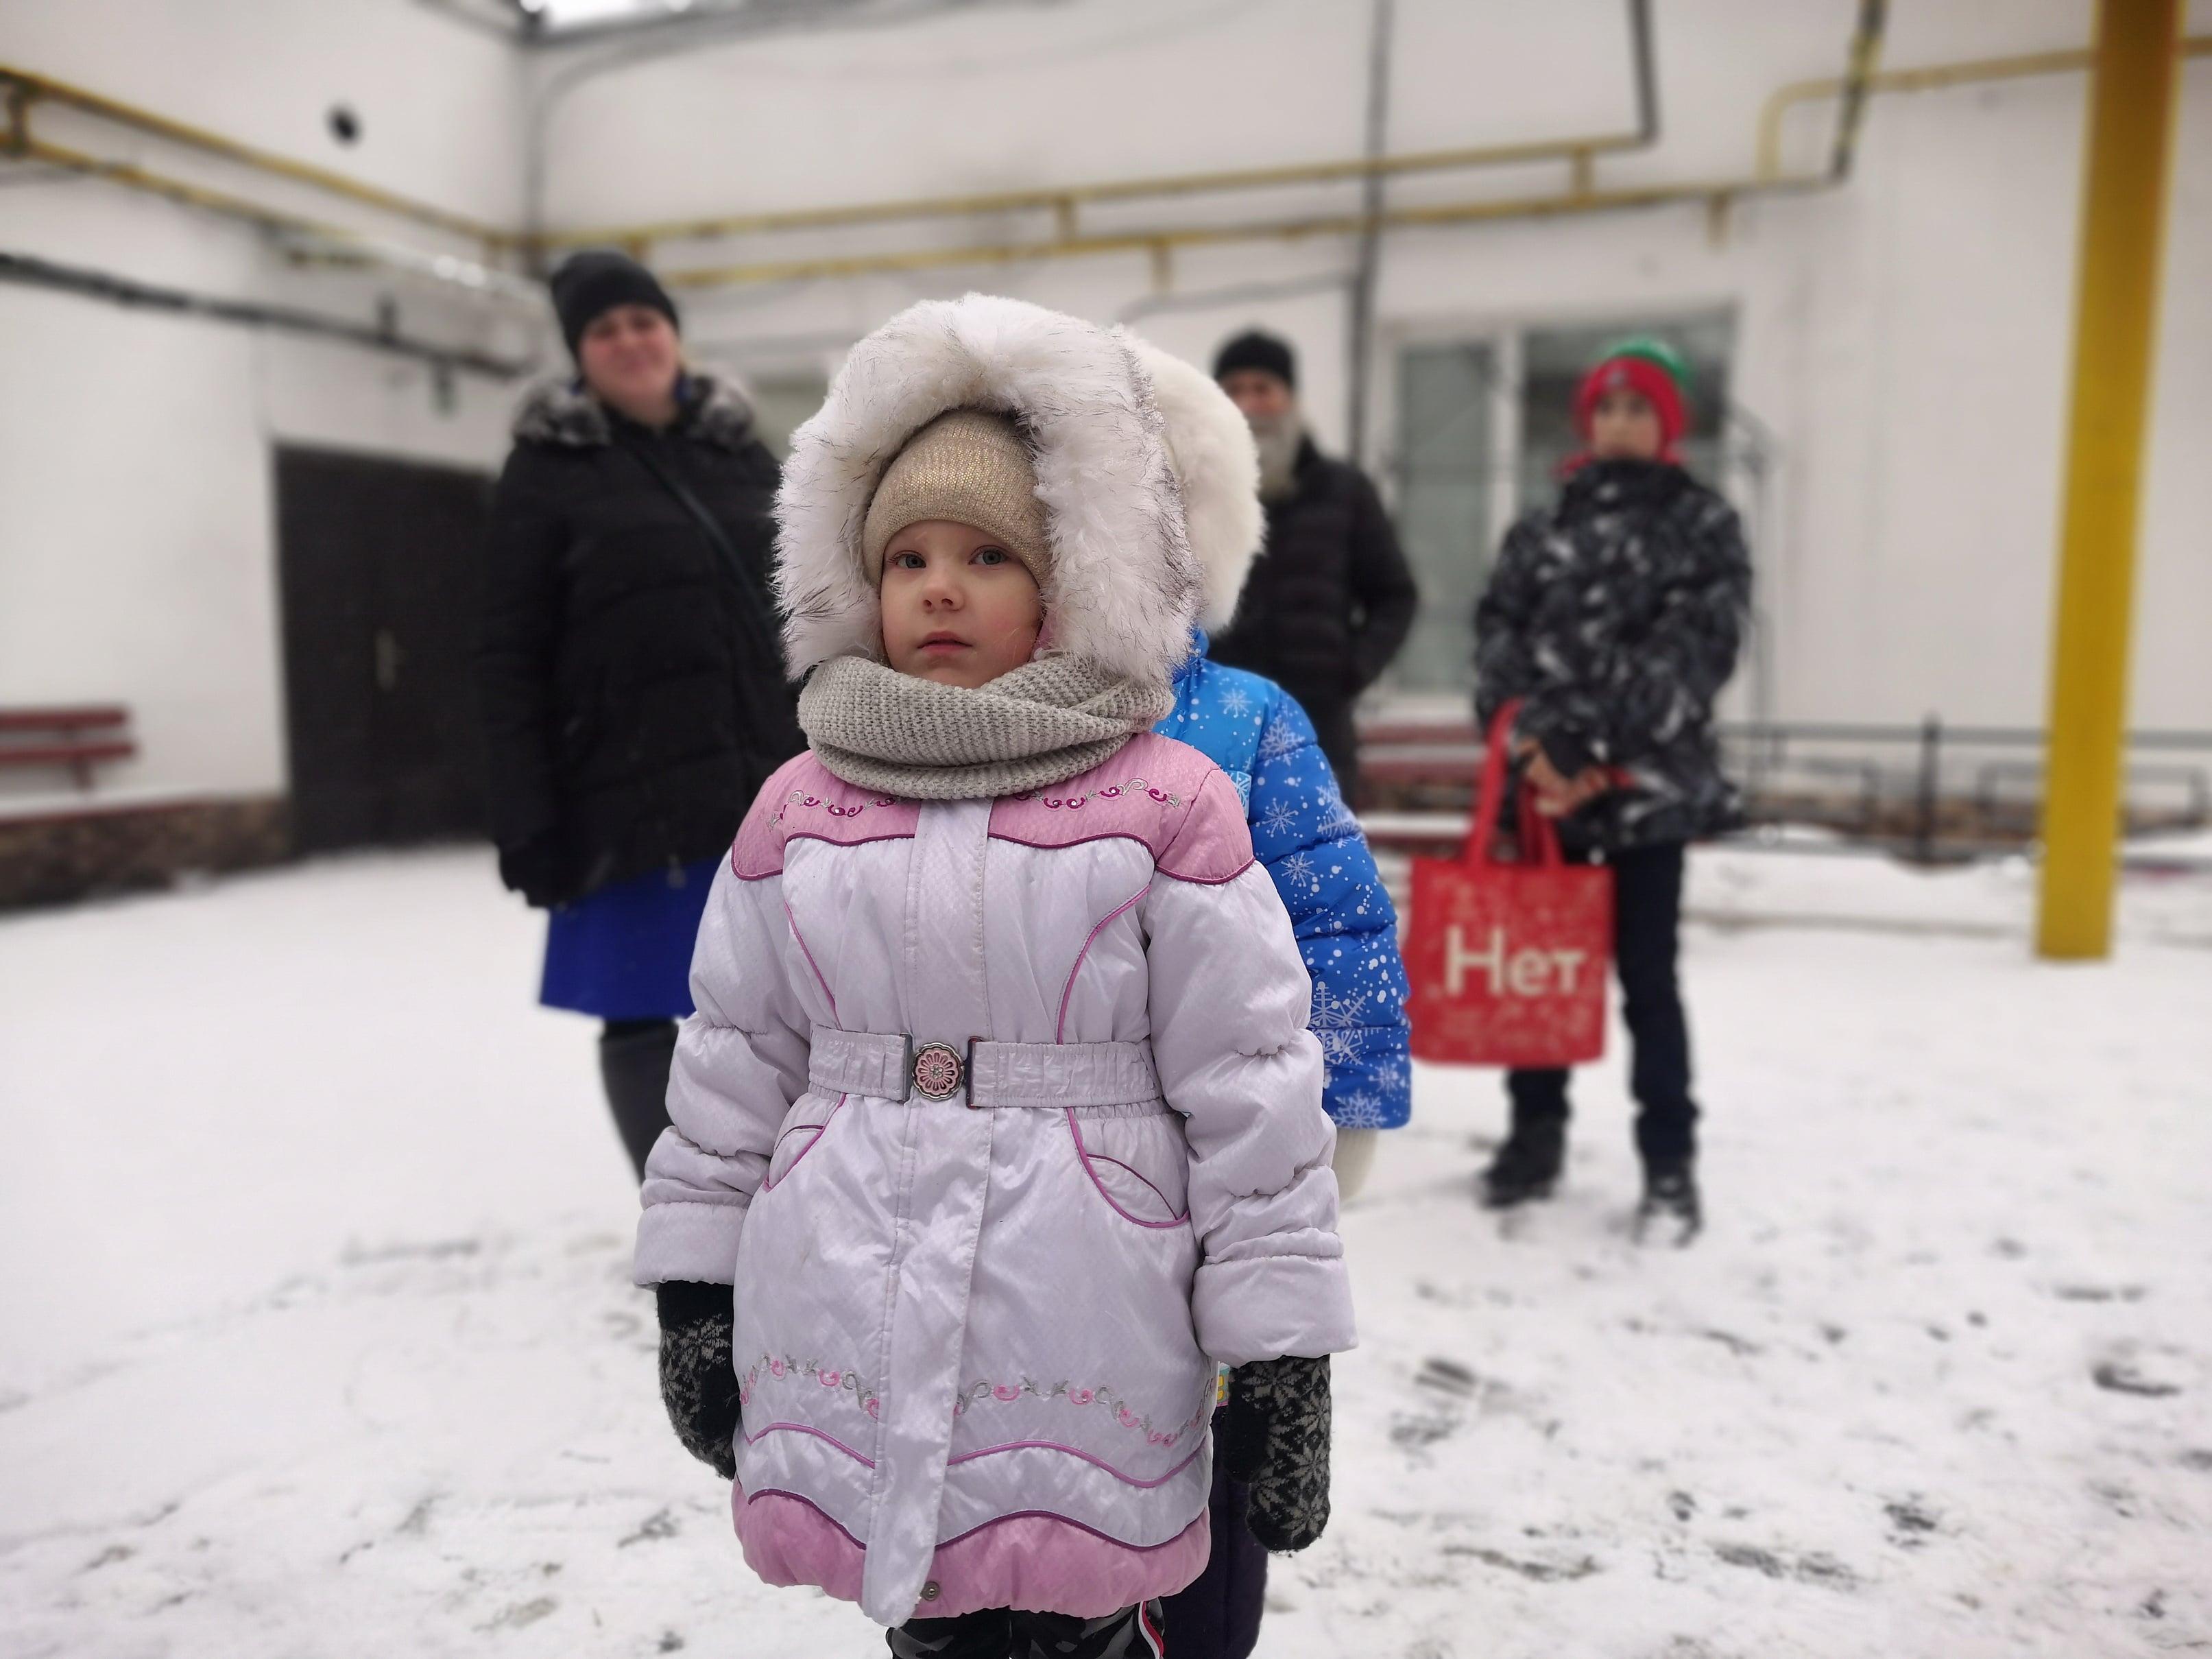 http://monuspen.ru/photoreports/b3aa9199fb88f725c81fb67701ac2fg0.jpg